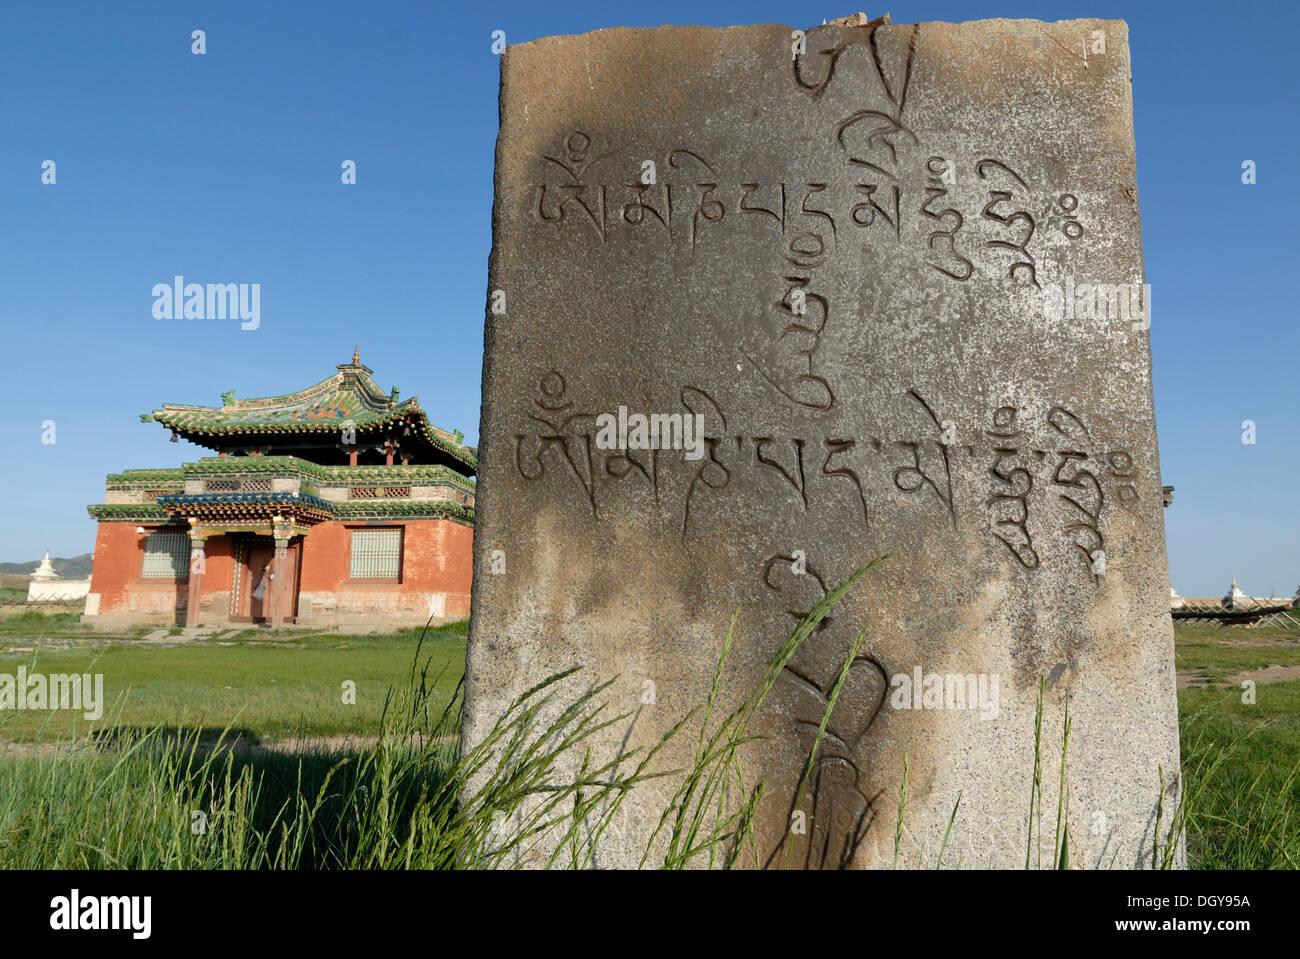 Tibetan inscription on a stone slab and temples in the inner complex of Erdene Zuu Khiid Monastery, Karakorum, Kharkhorin - Stock Image